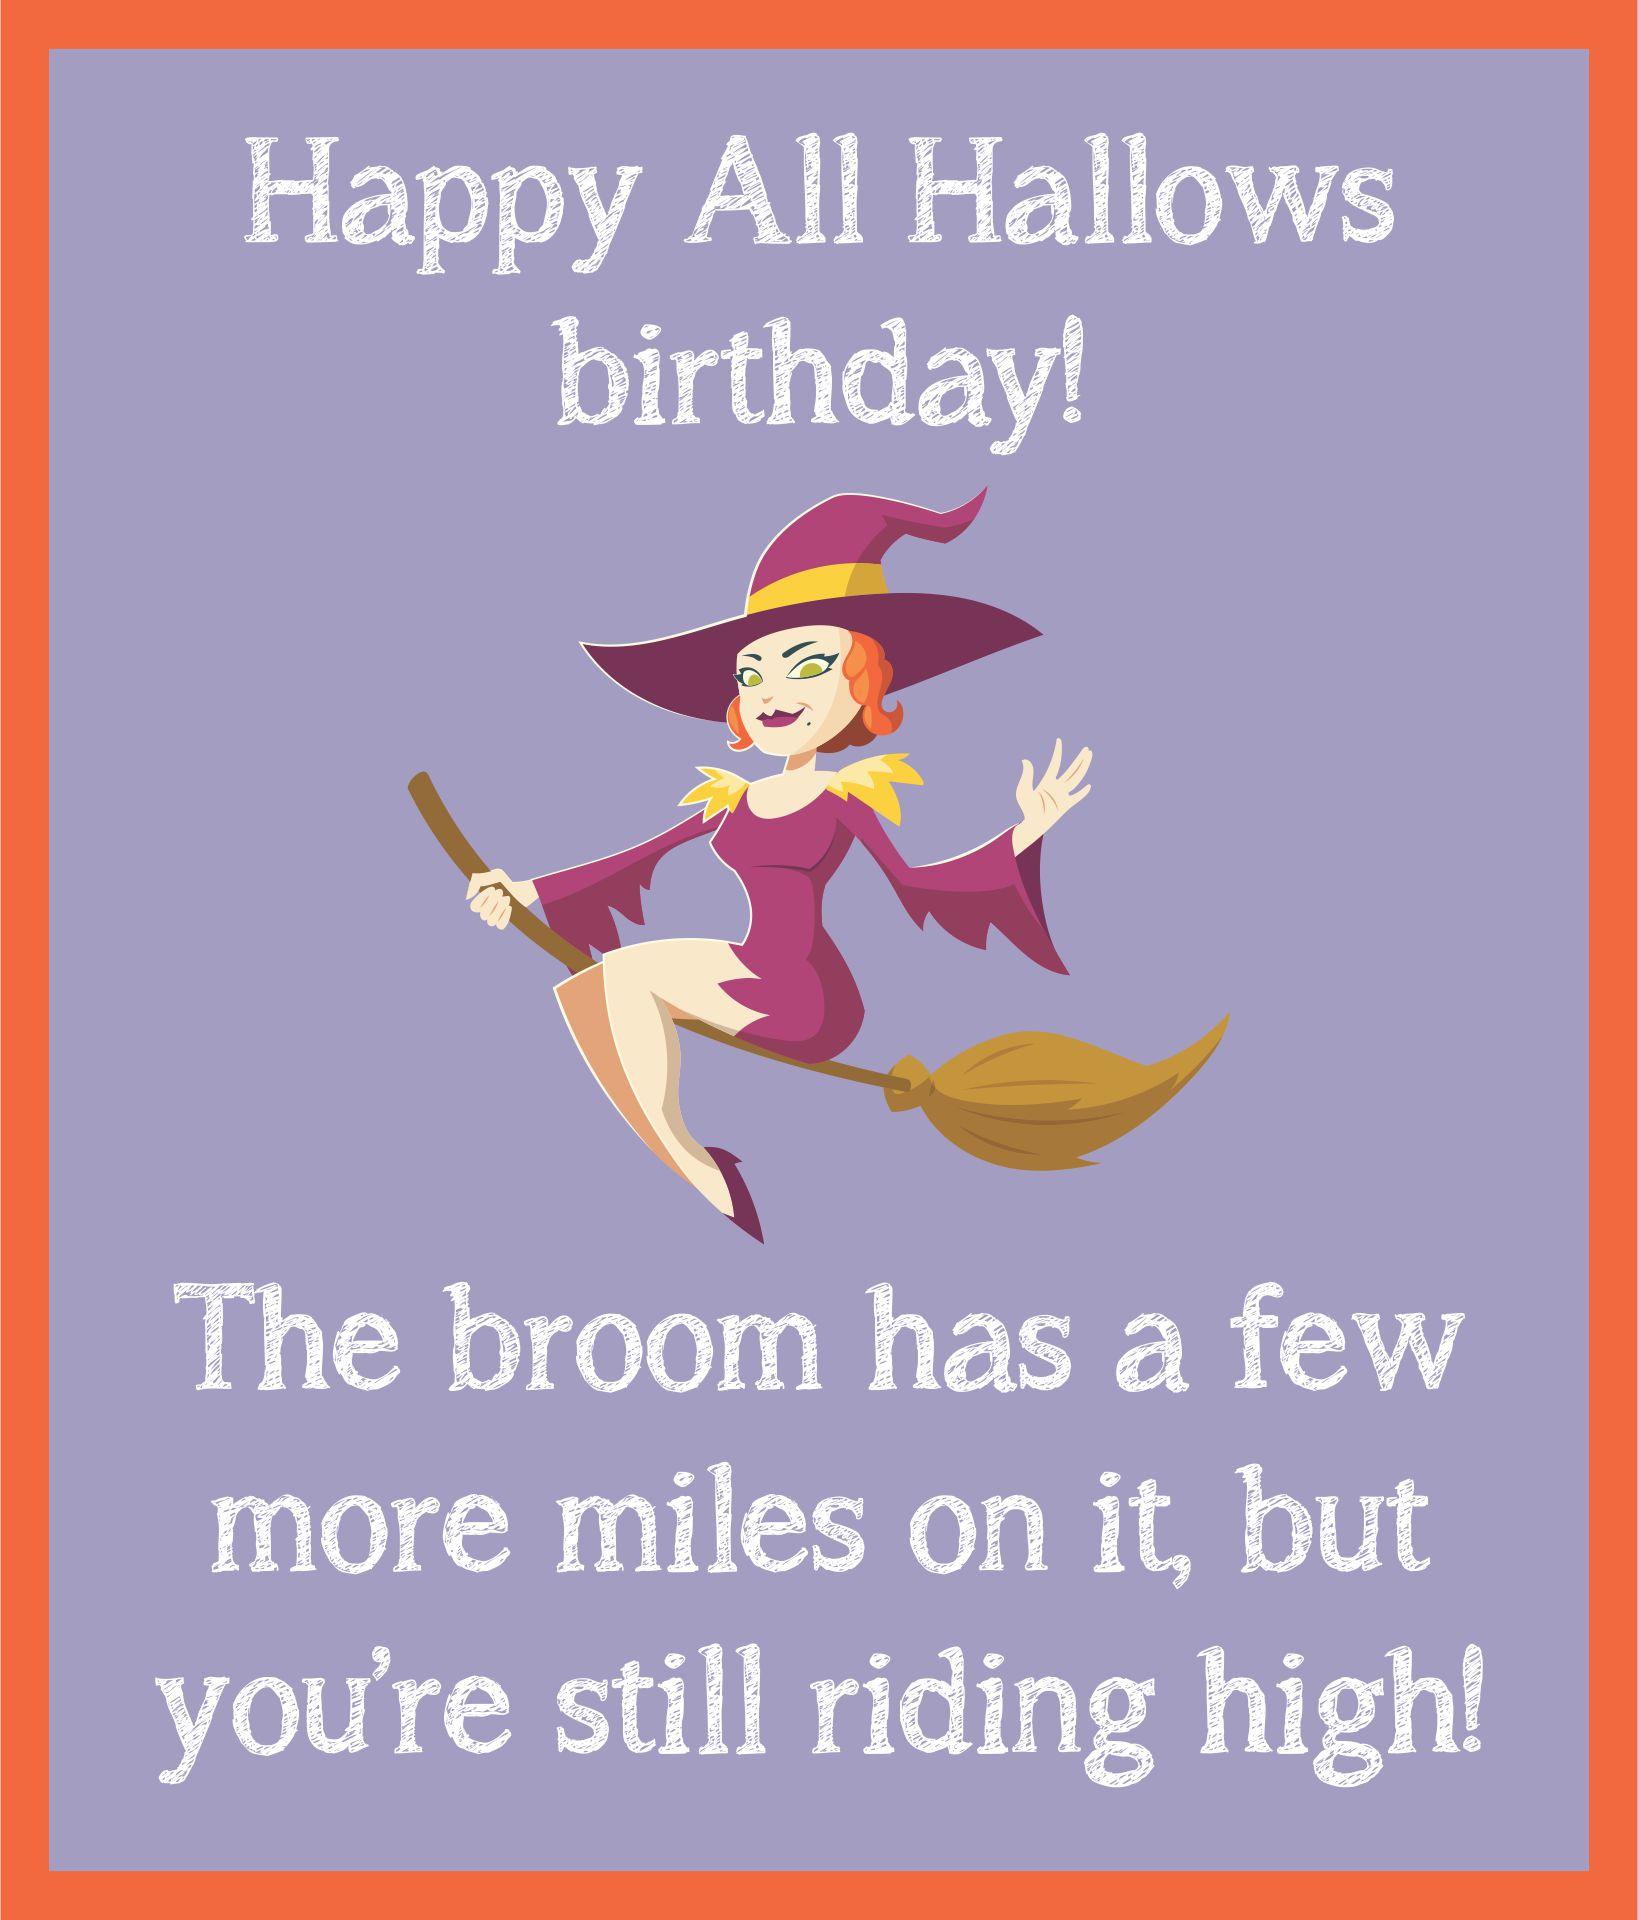 Funny Halloween Birthday Cards